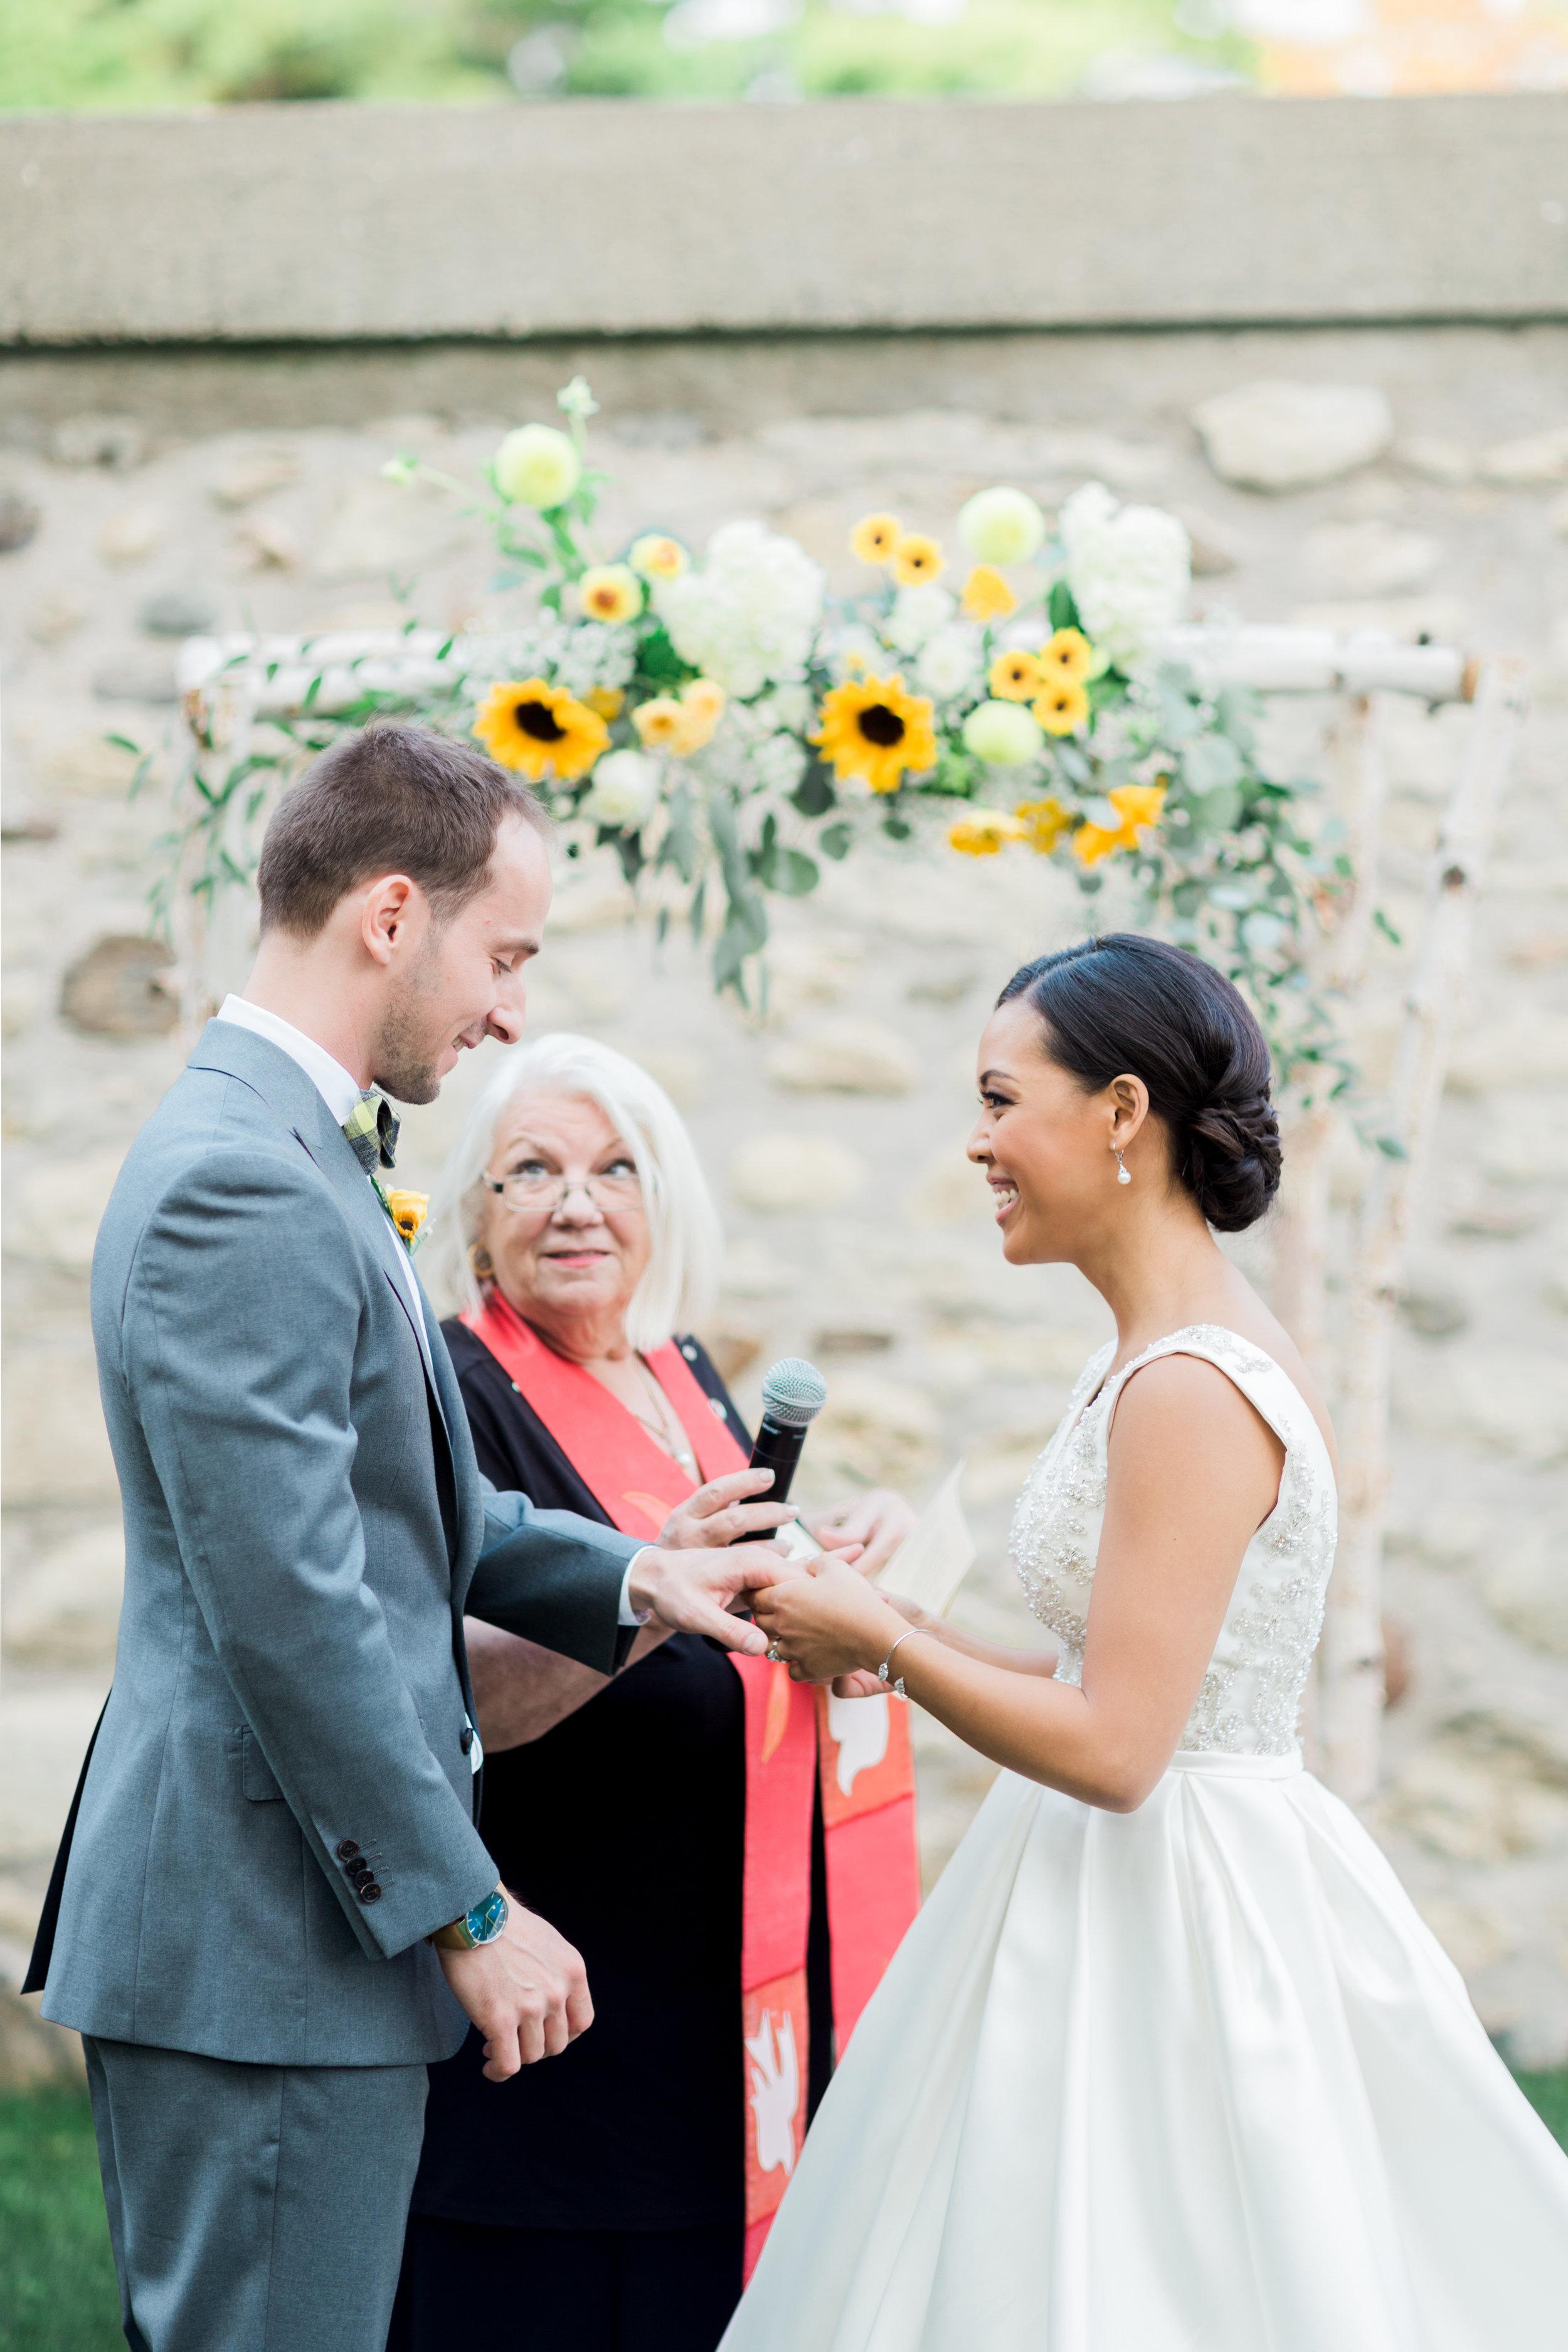 Alton Mills Wedding - Ceremony-61.jpg